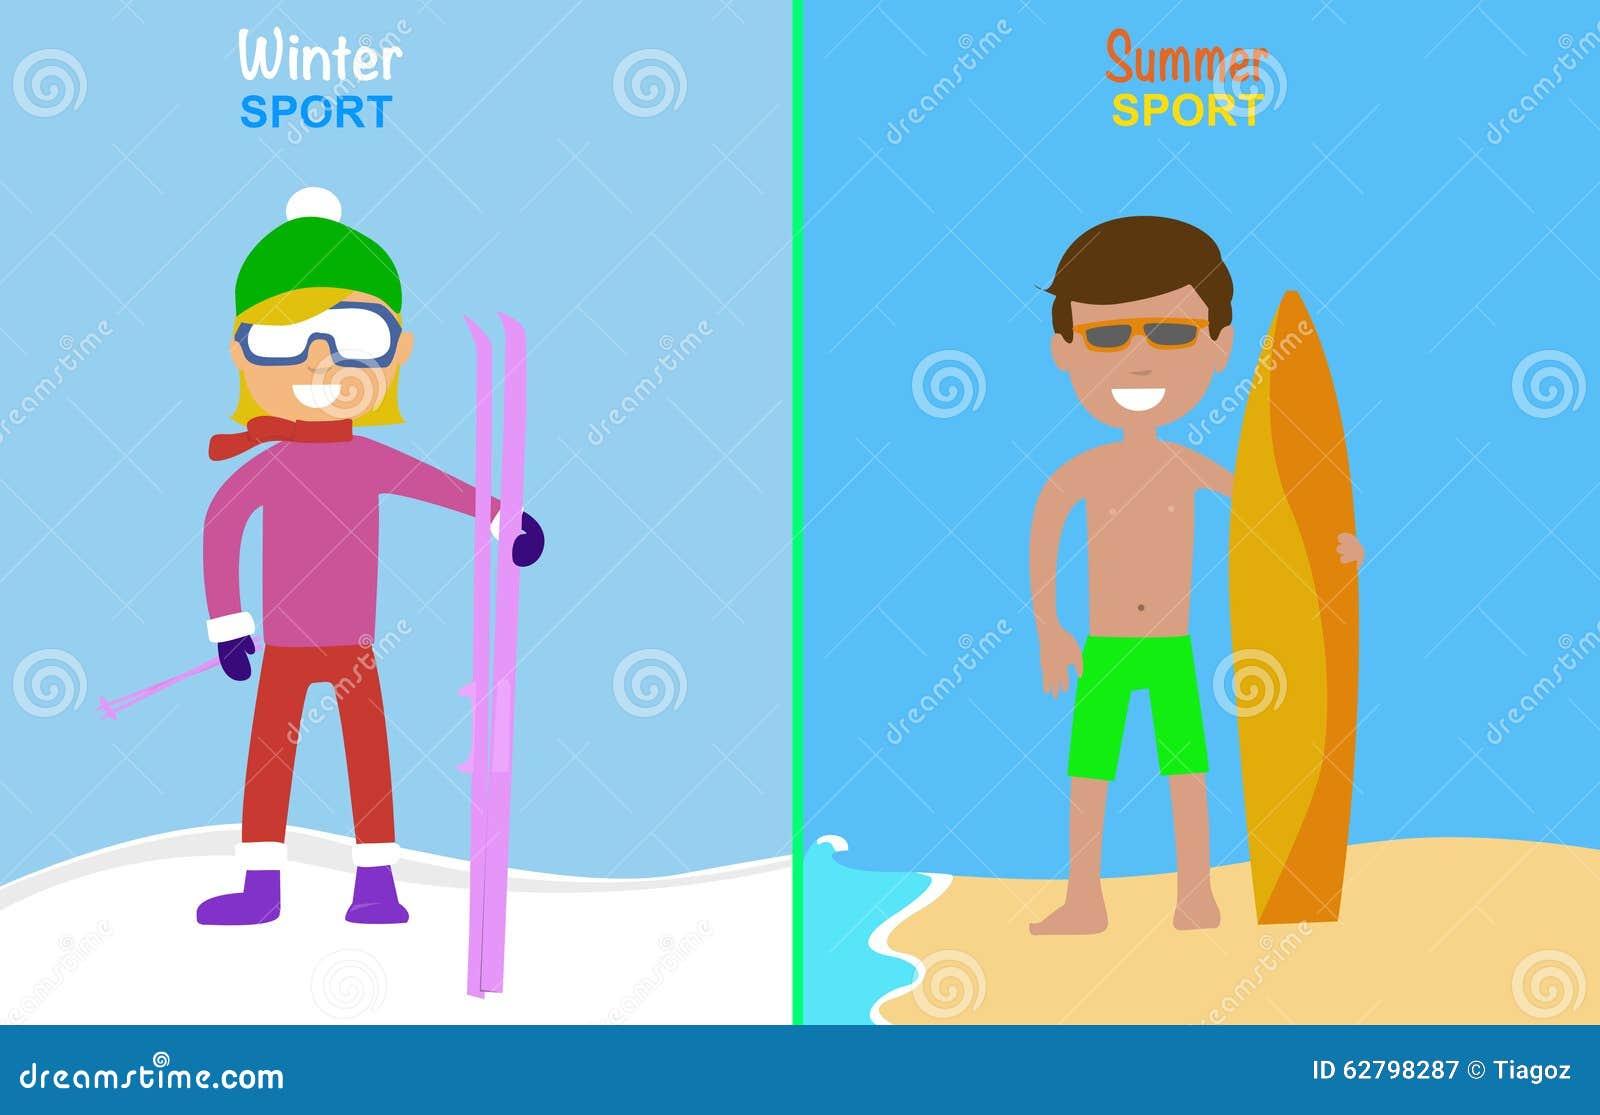 Summer Sports Cartoon